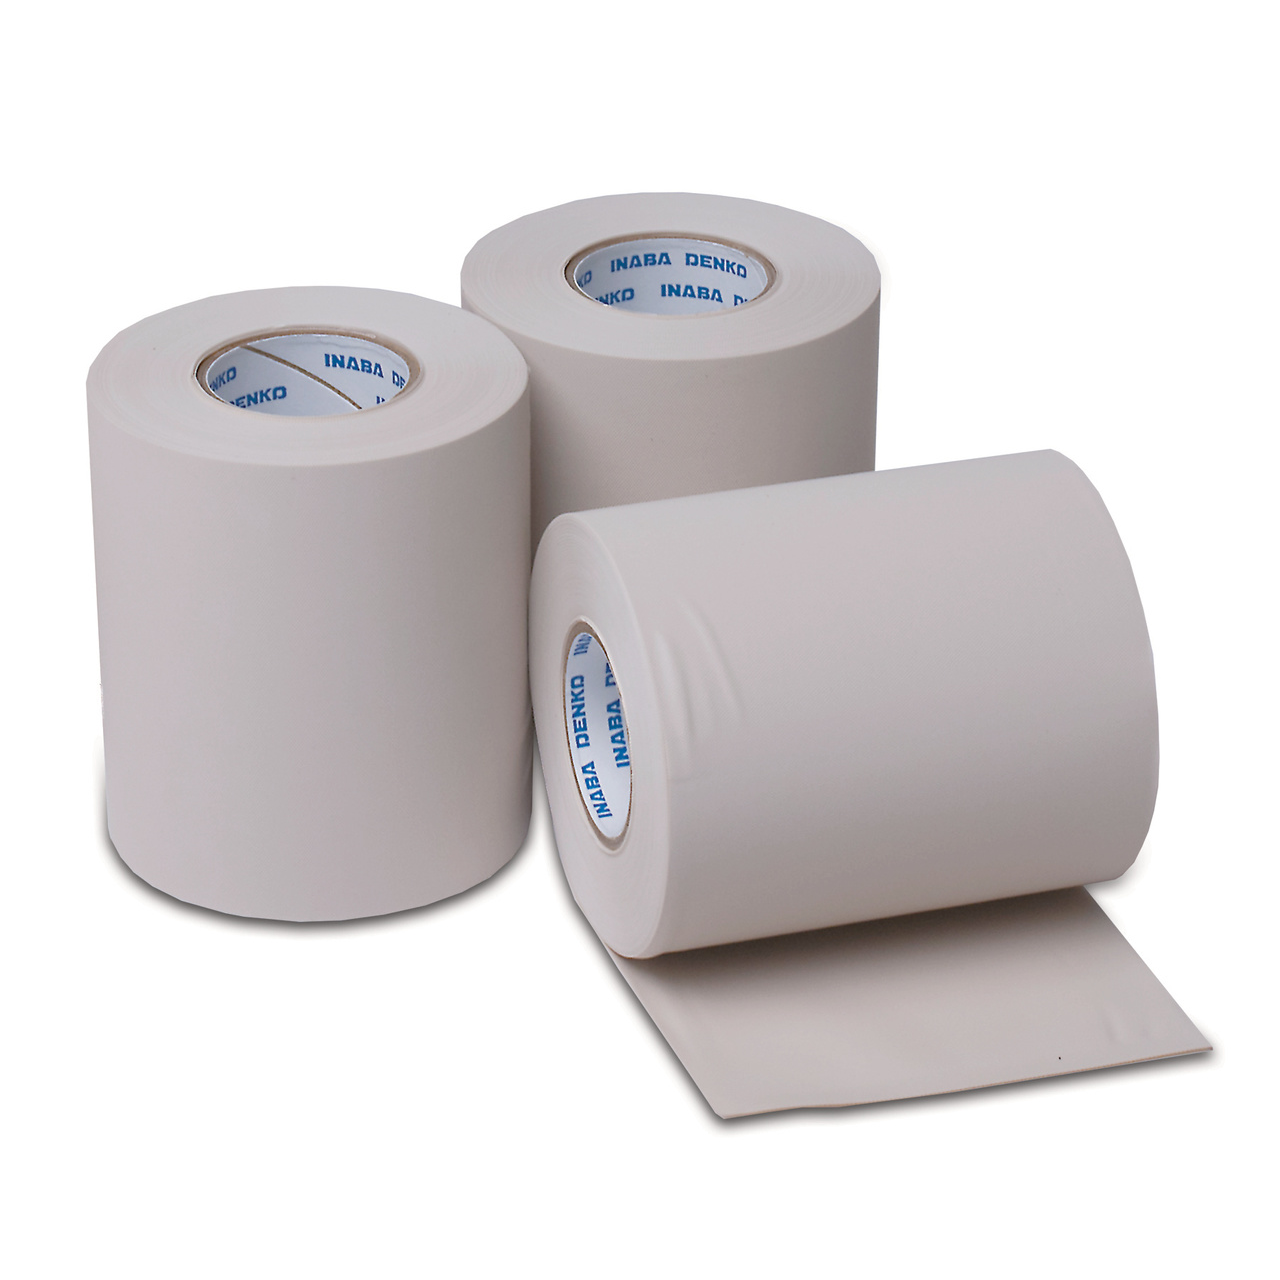 HN-75-I UV-resistant Non-adhesive Wrap